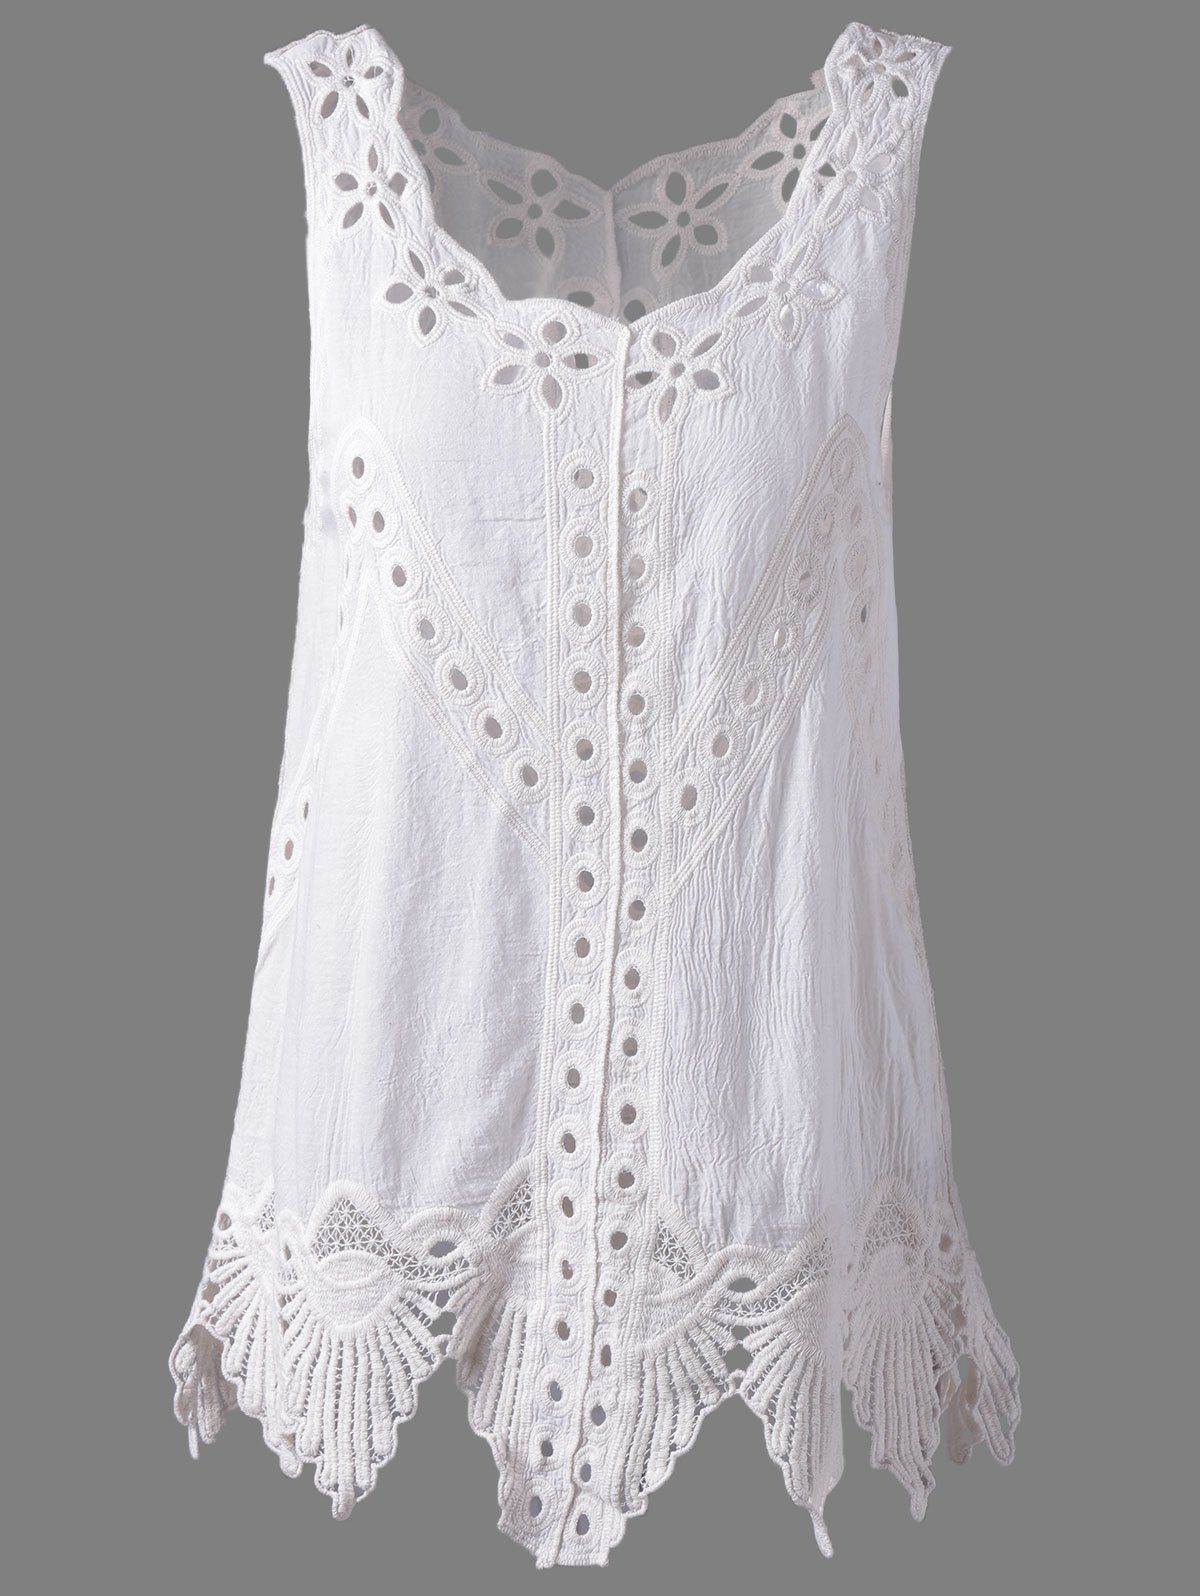 Bohemian Scoop Neck Solid Color Crochet Sleeveless Blouse For Women ...